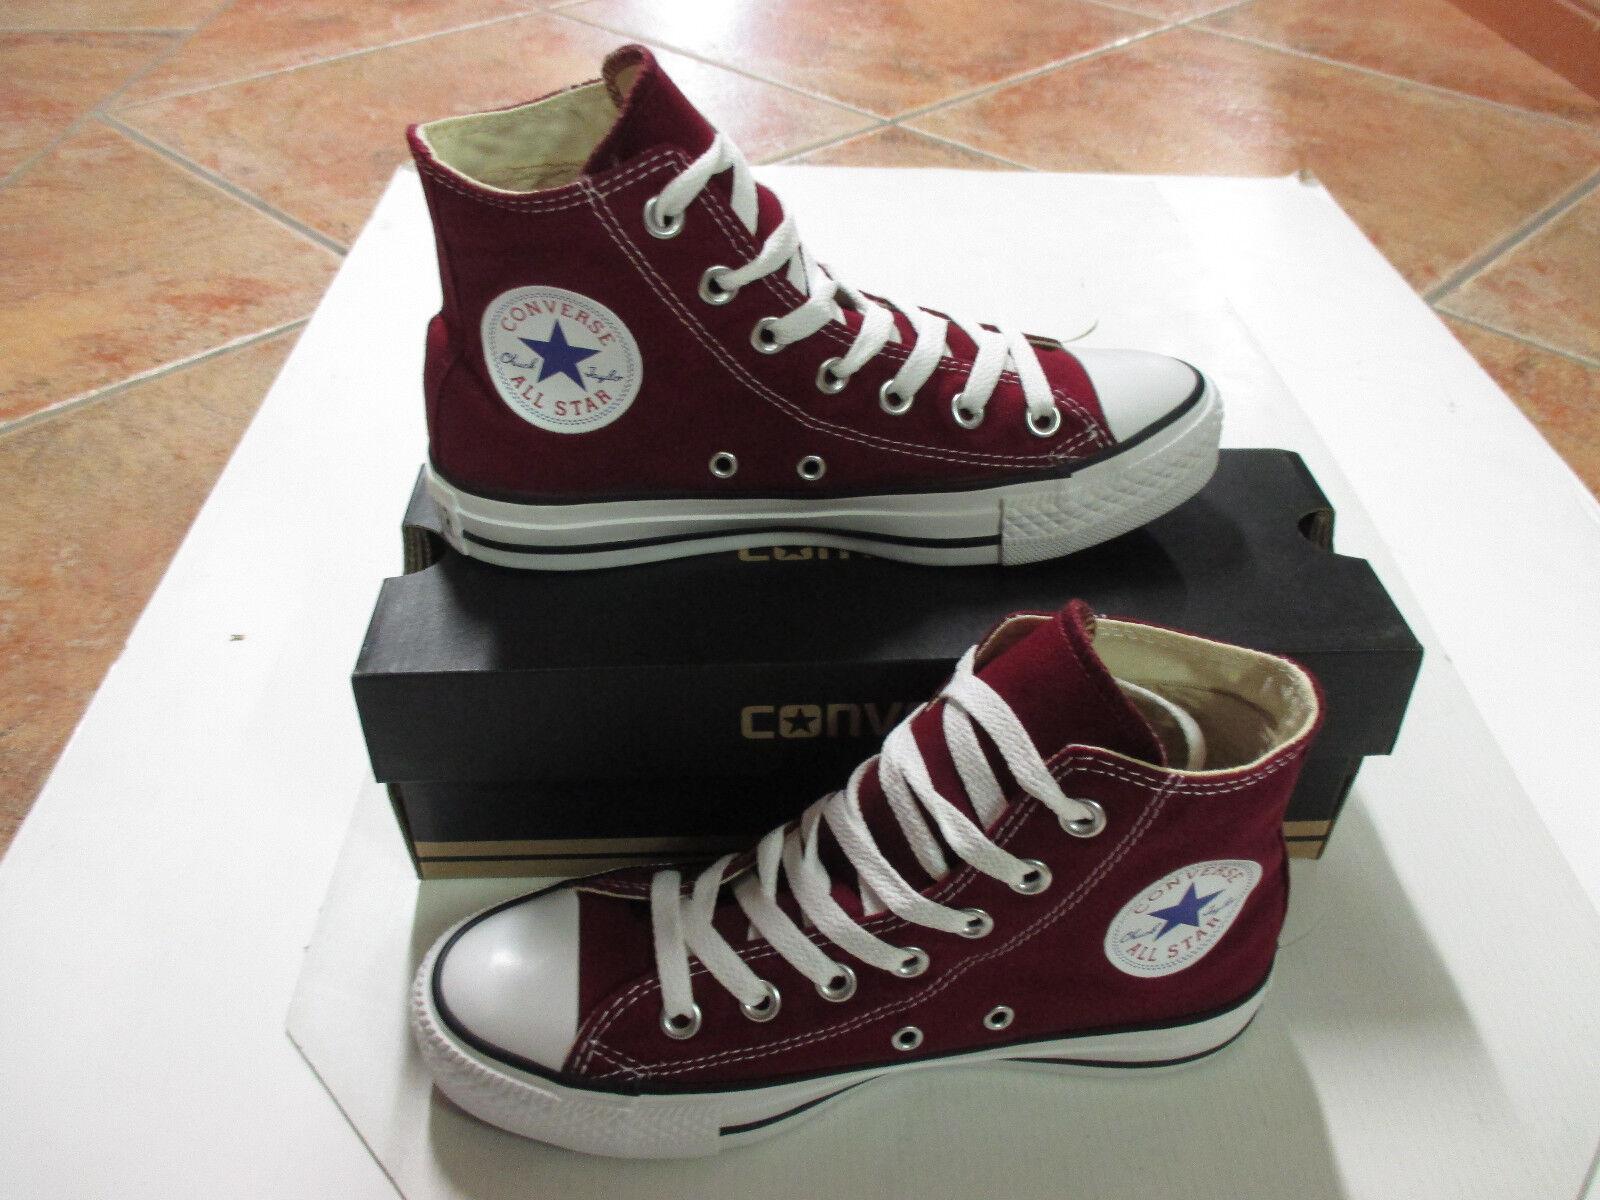 Converse Chucks Bll Star HI Größe 41 maroon weinrot M9613C Neu